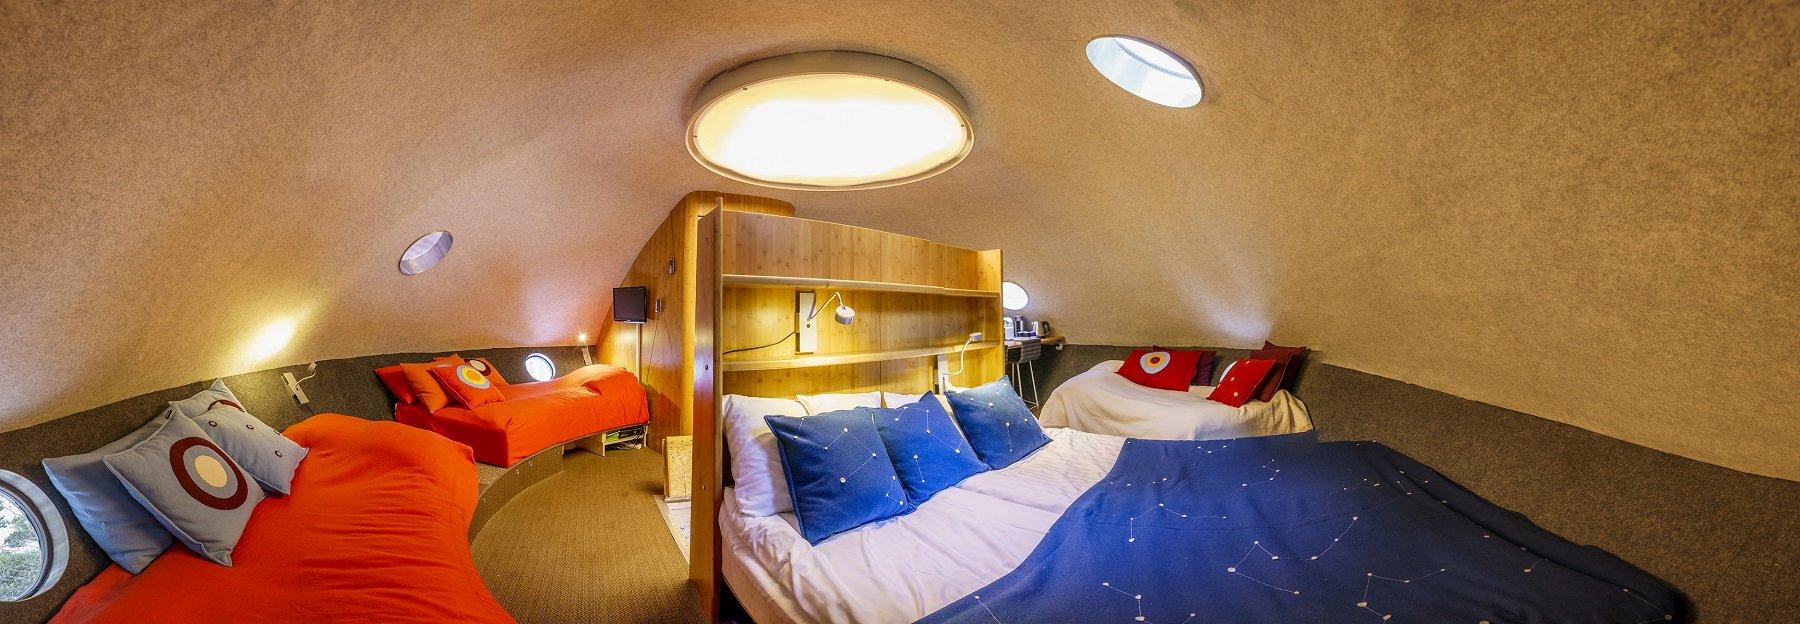 Treehotel-Harads-ufo-interior